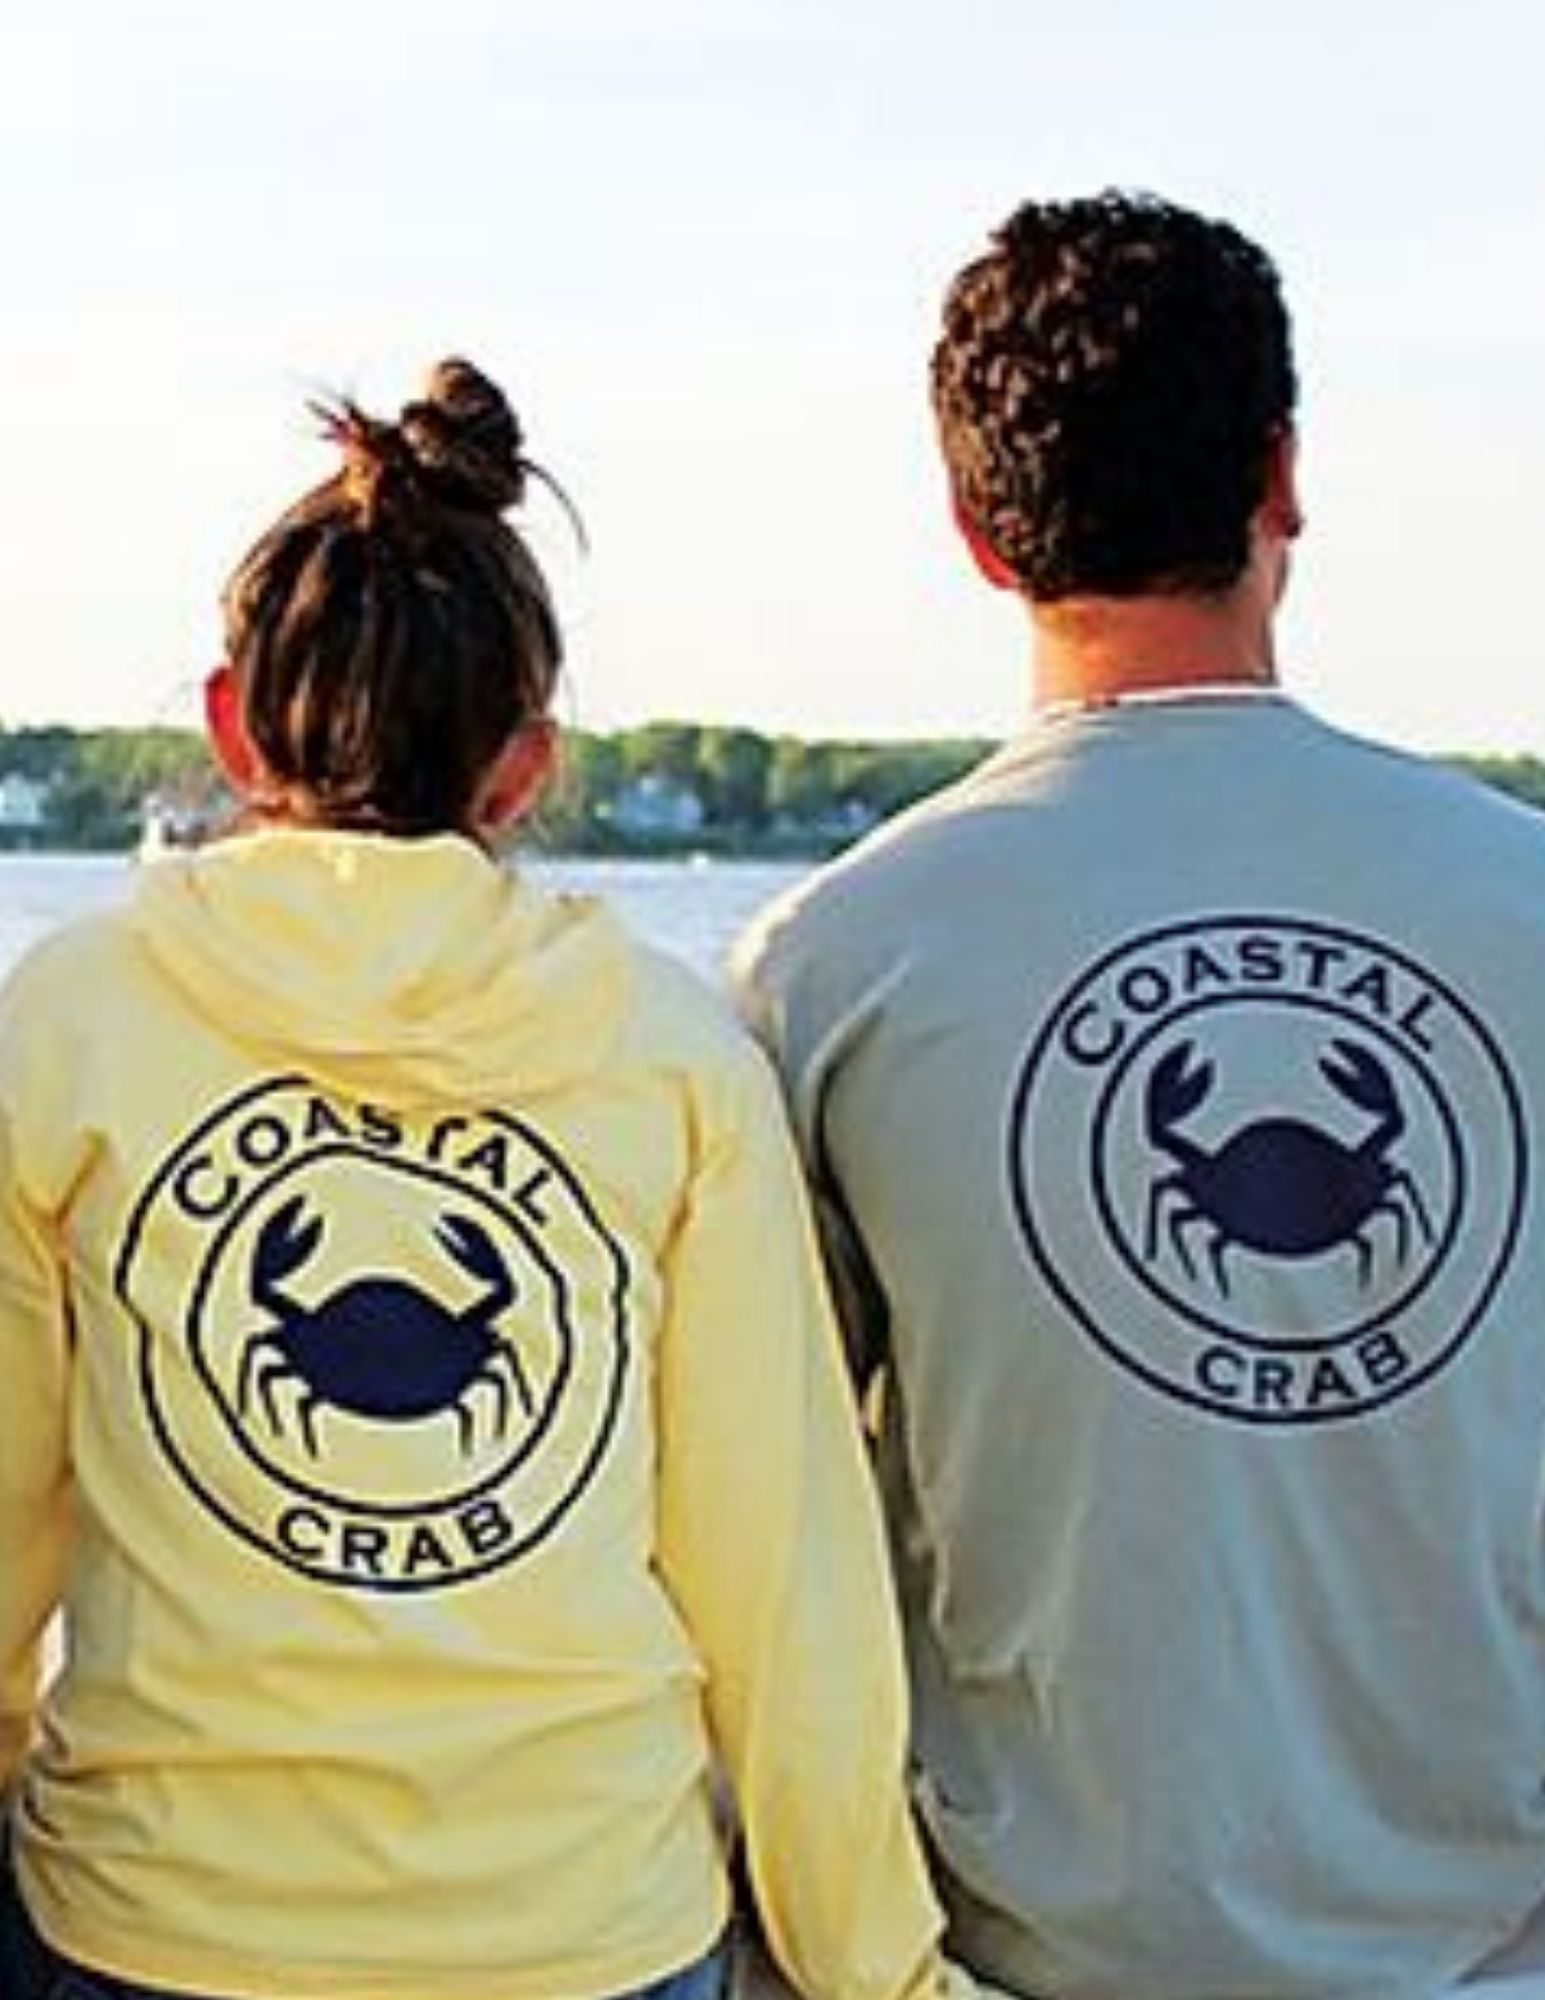 Coastal Crab CT Coastal Gifts on Main Niantic-13